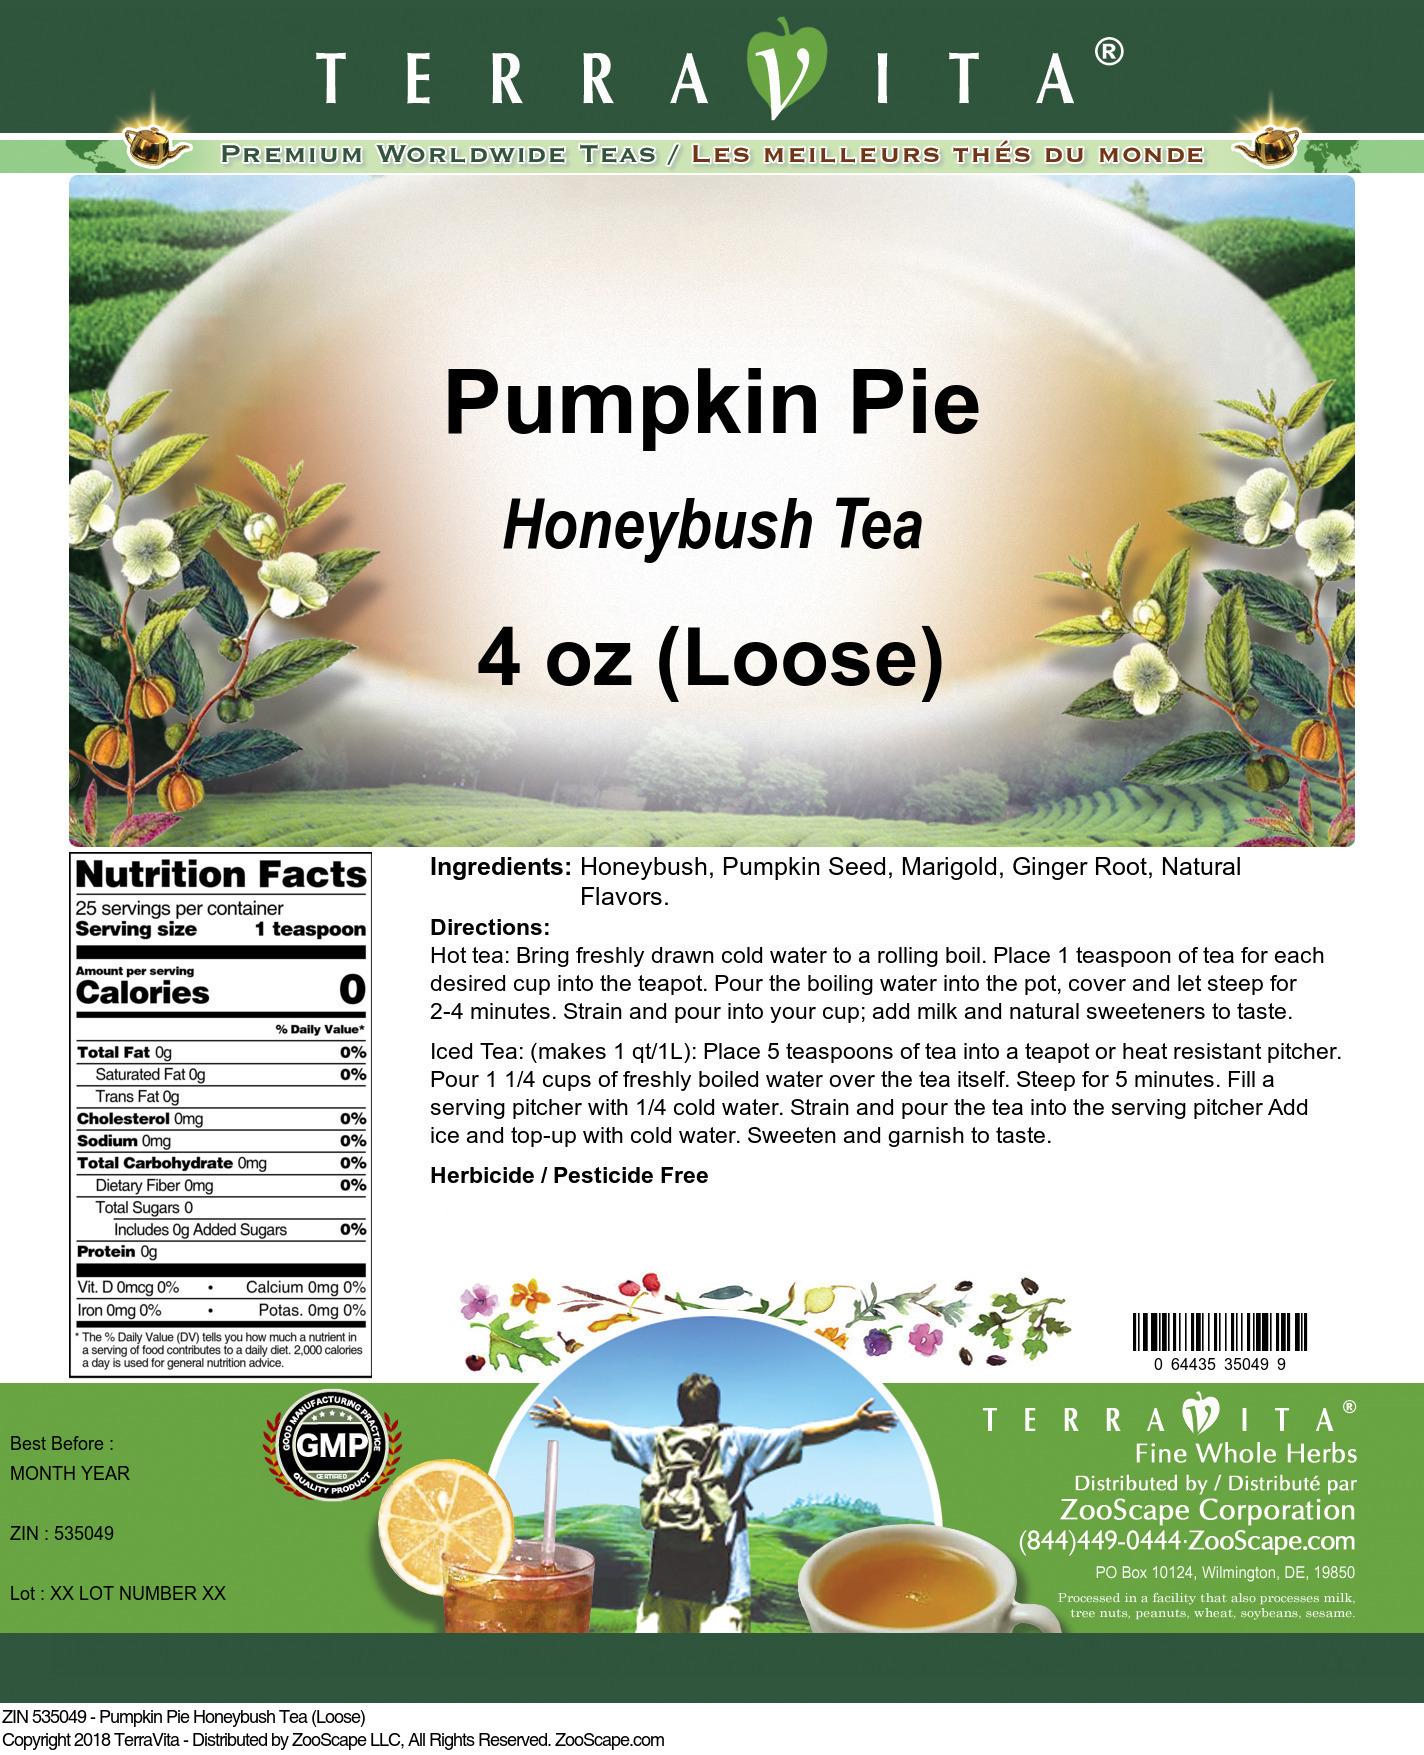 Pumpkin Pie Honeybush Tea (Loose)